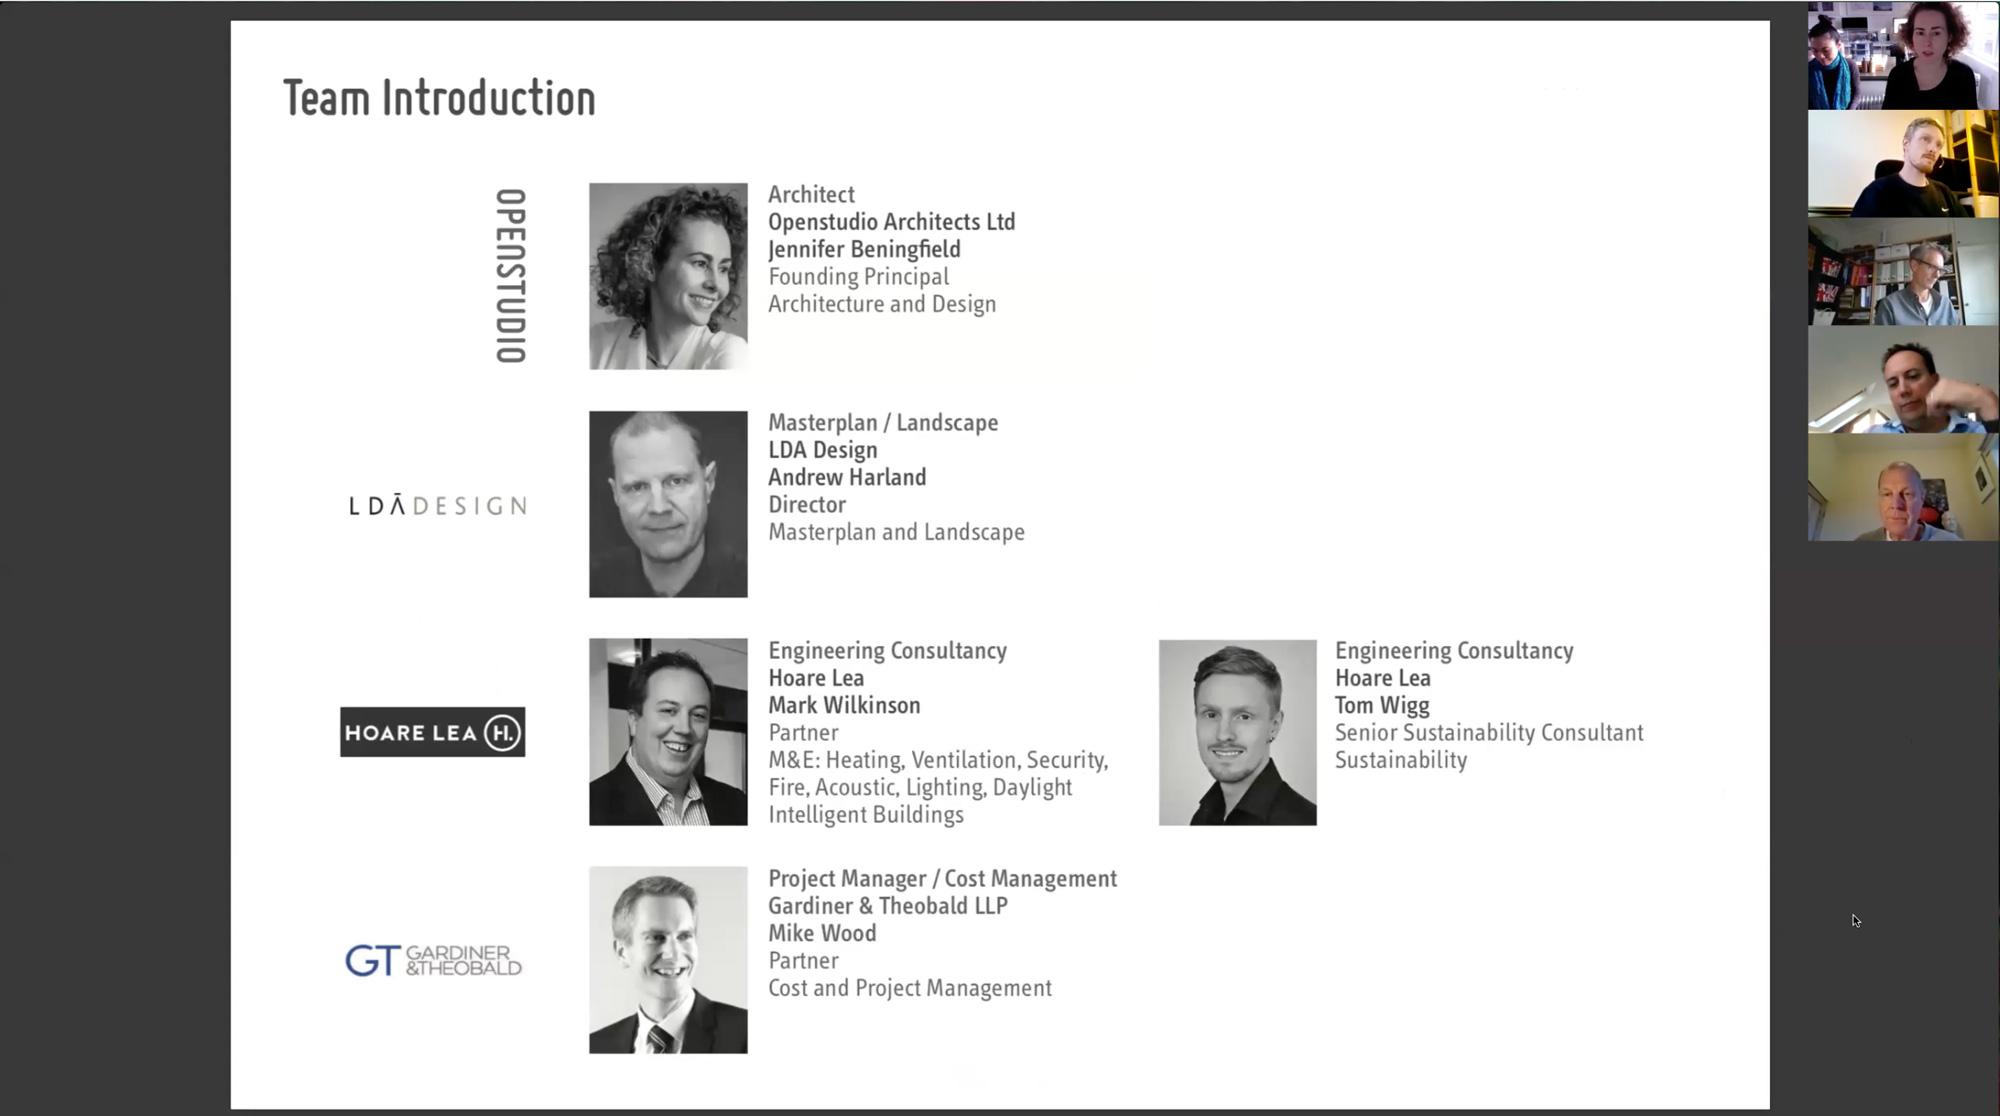 home-of-2030-openstudio-architects-online-meeting